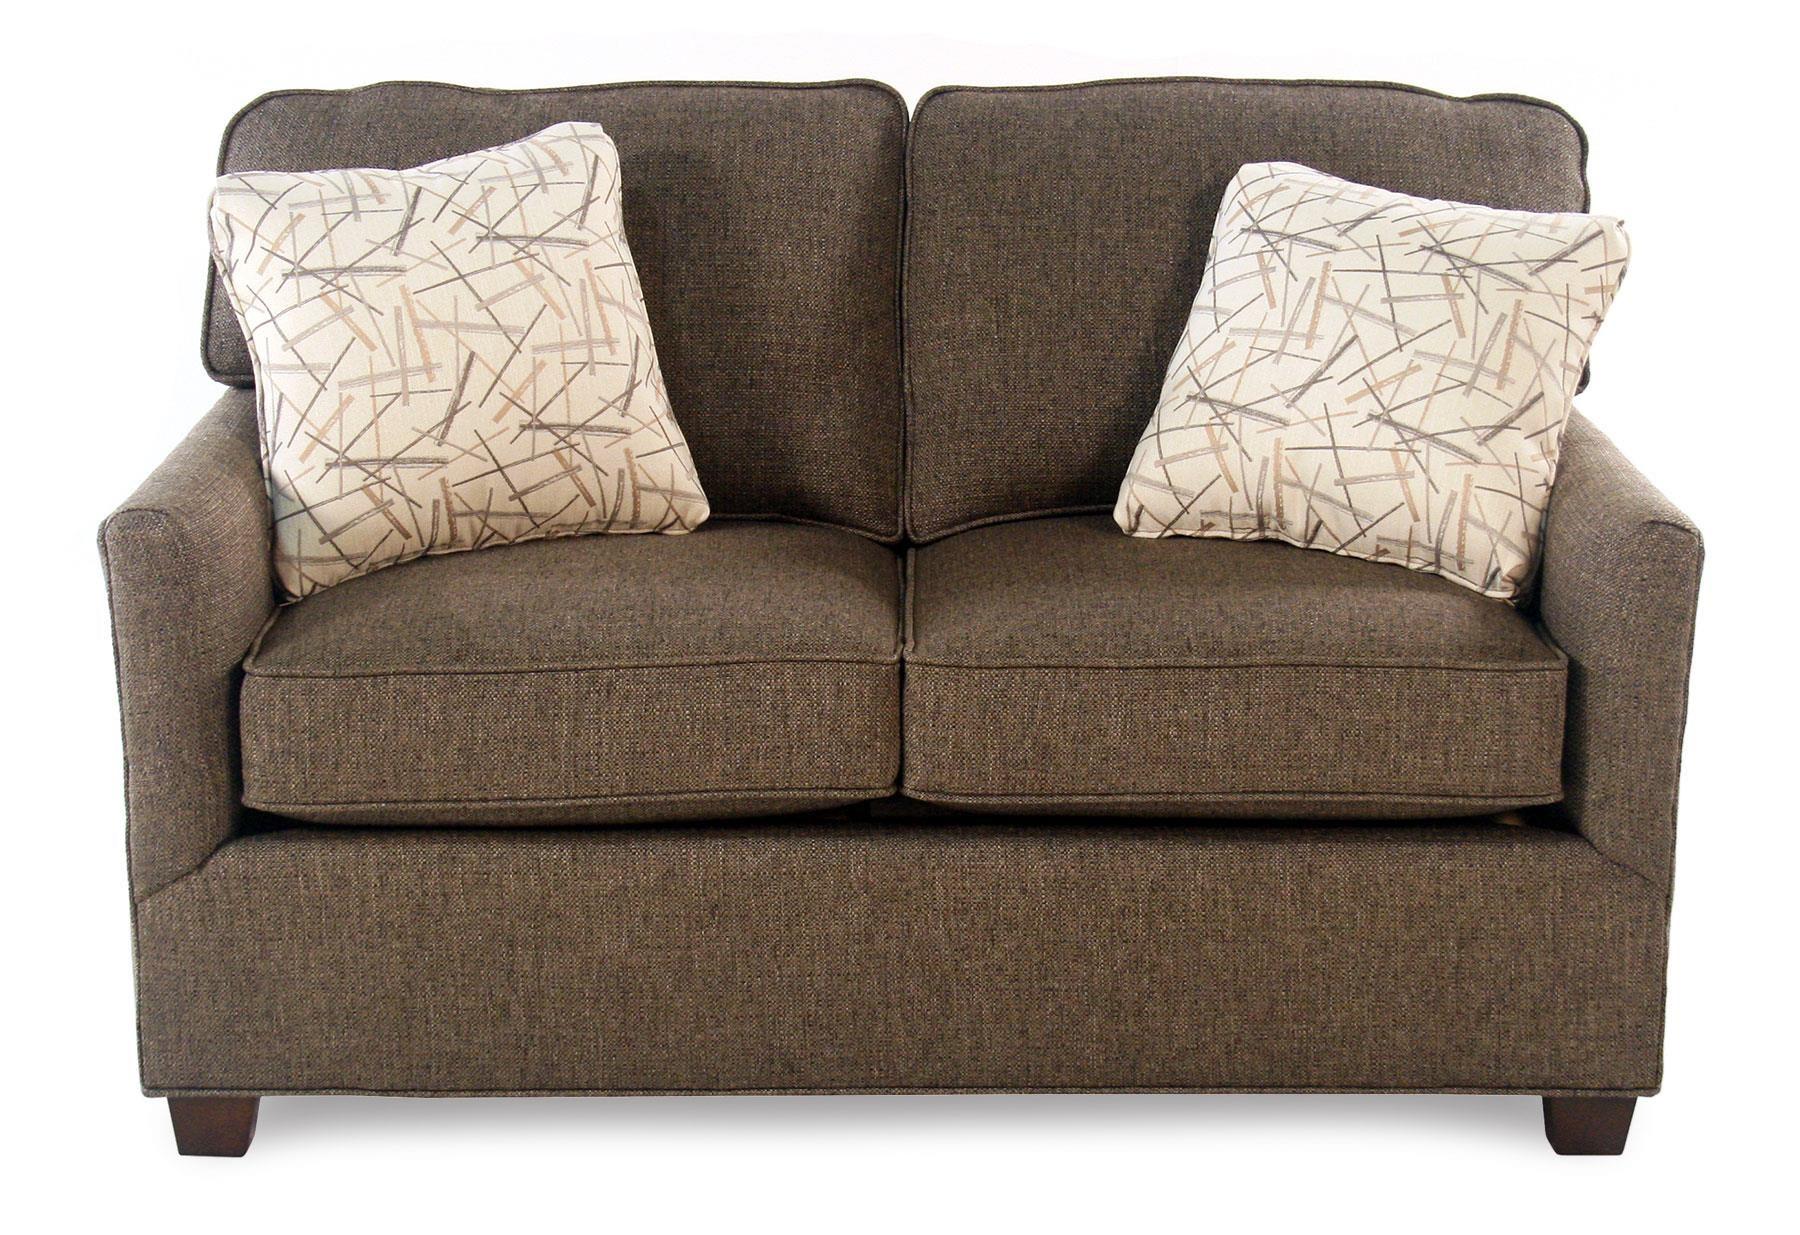 Hallagan Furniture Highland Park Loveseat   Item Number: 44 ABT MR LS